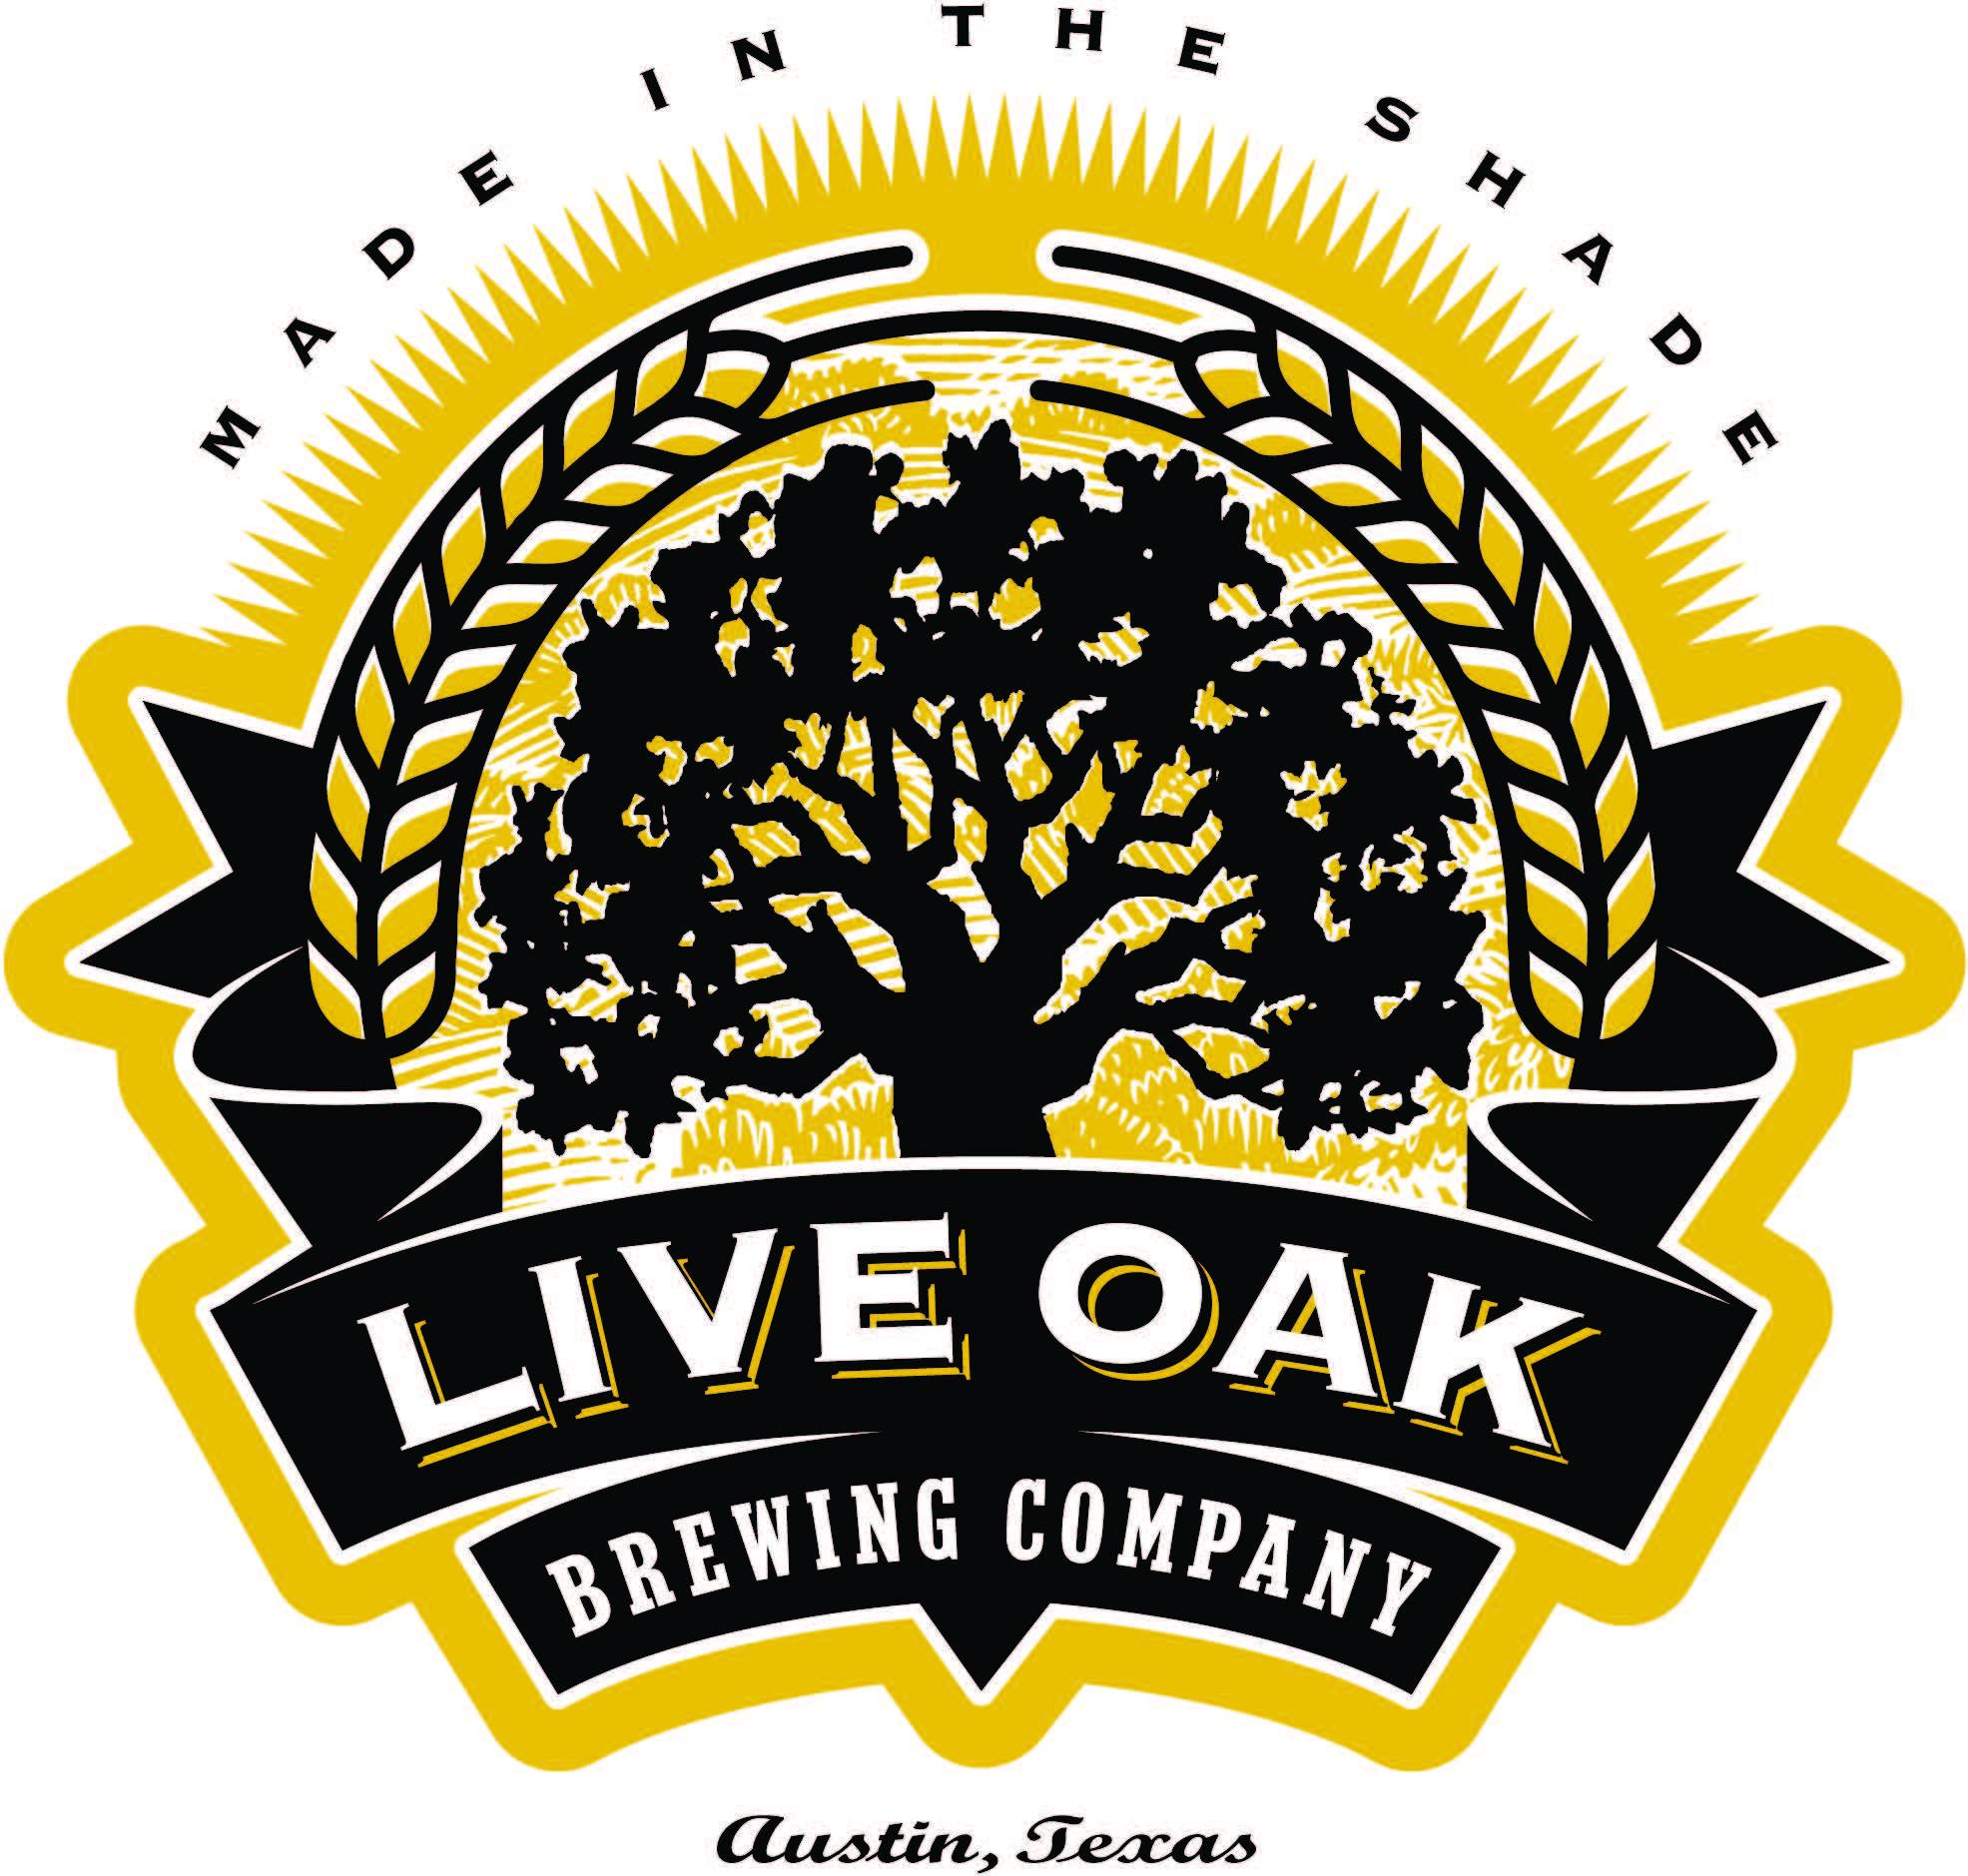 Live Oak's Hefeweizen